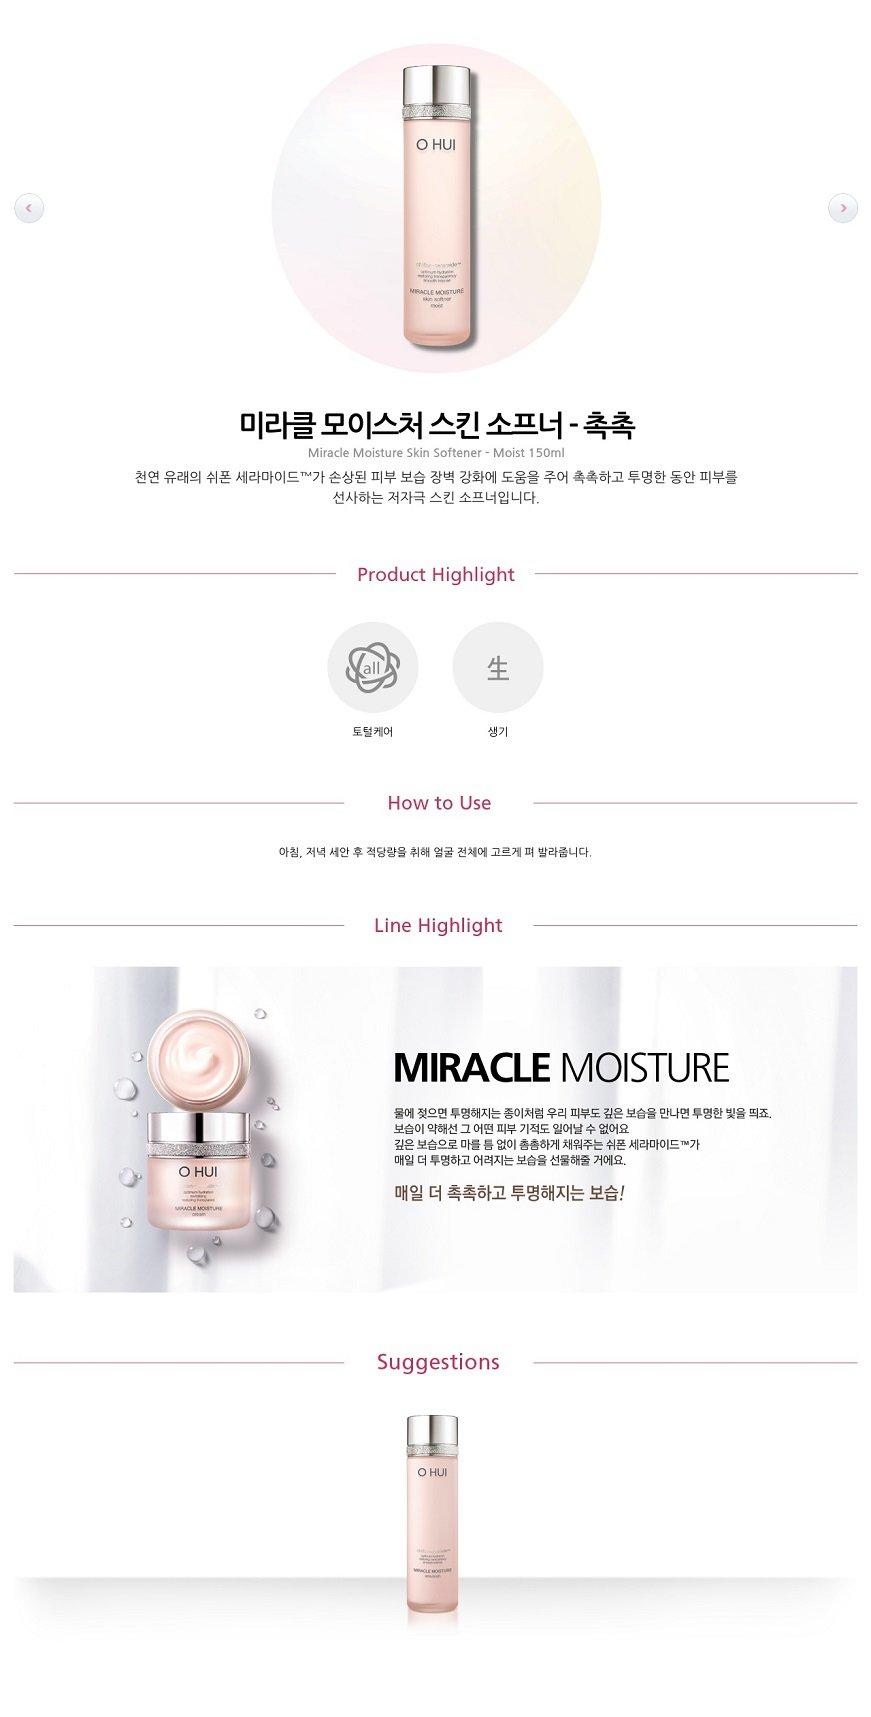 OHUI Miracle Moisture Skin Softener Moist 150ml malaysia singapore indonesia